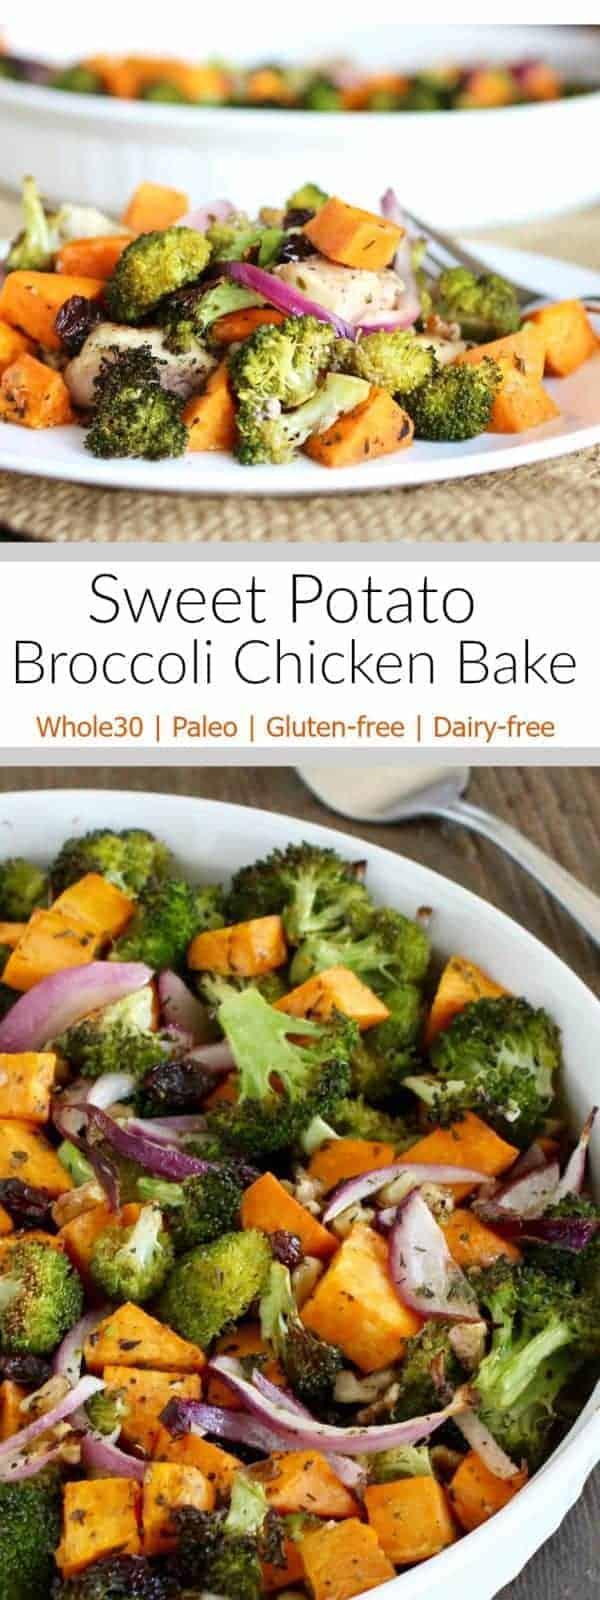 Chicken sweet potato broccoli recipe